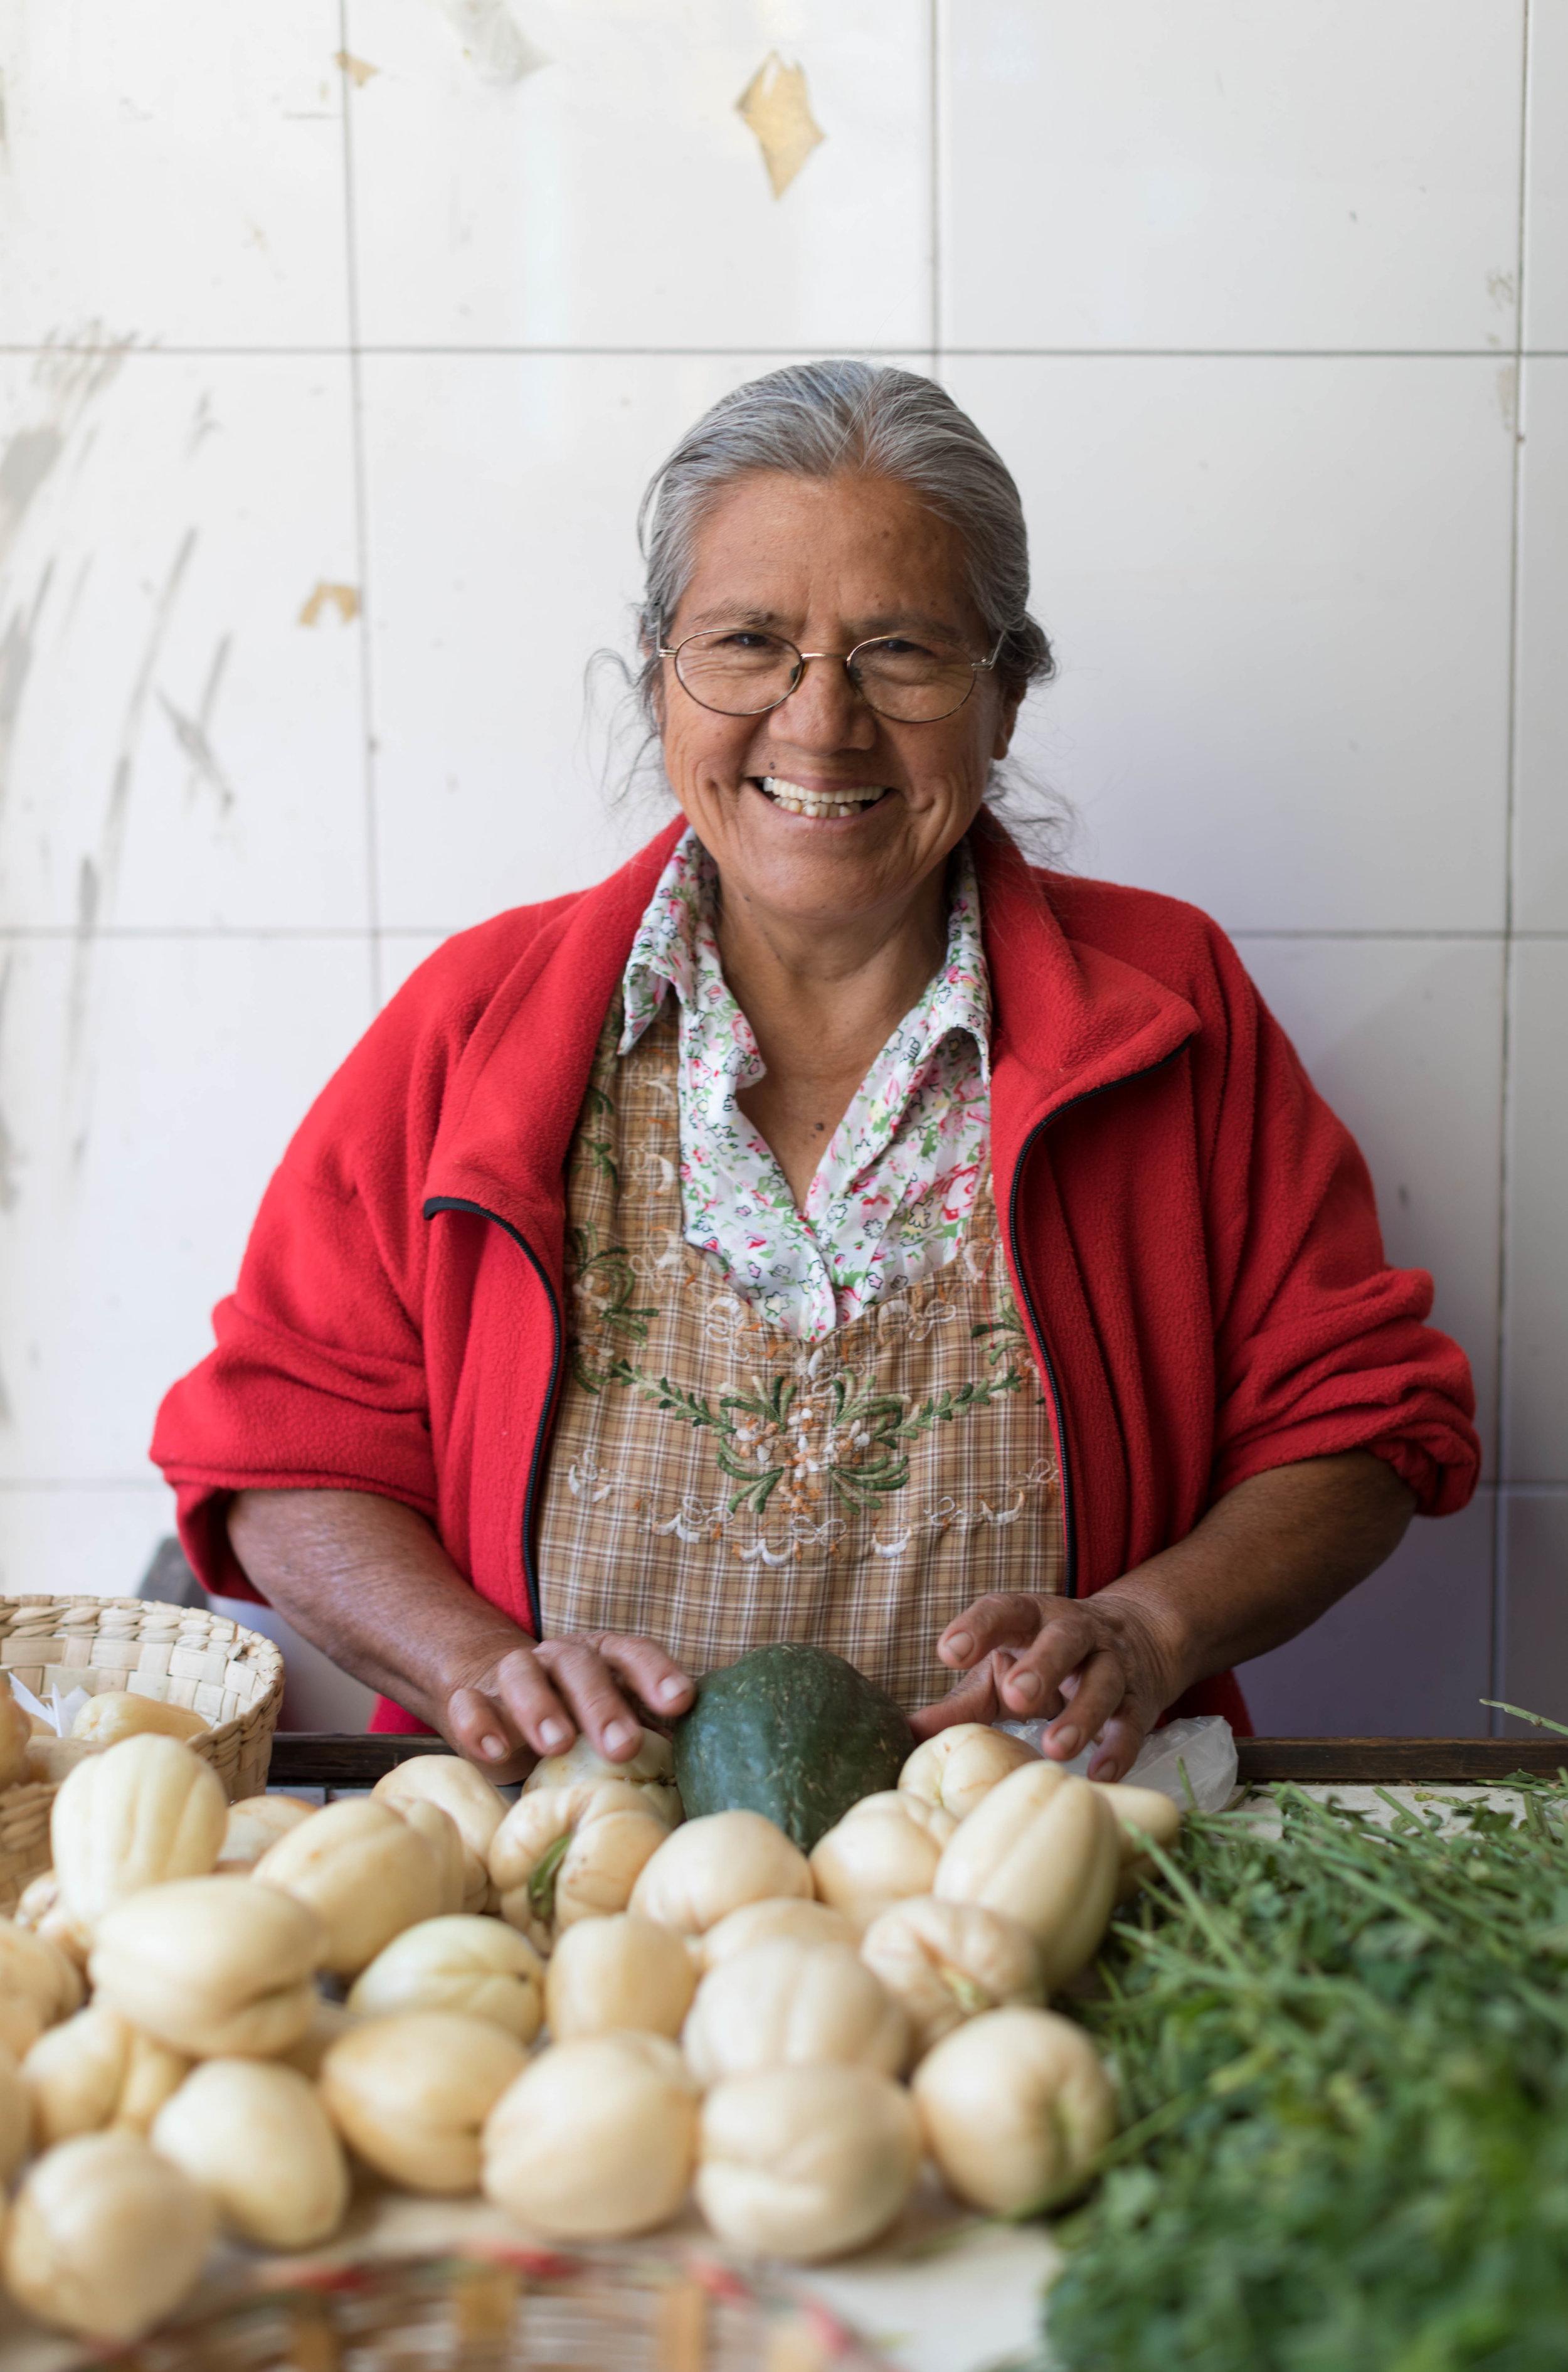 Woman selling chayote and alfalfa at the Mercado de la Merced.